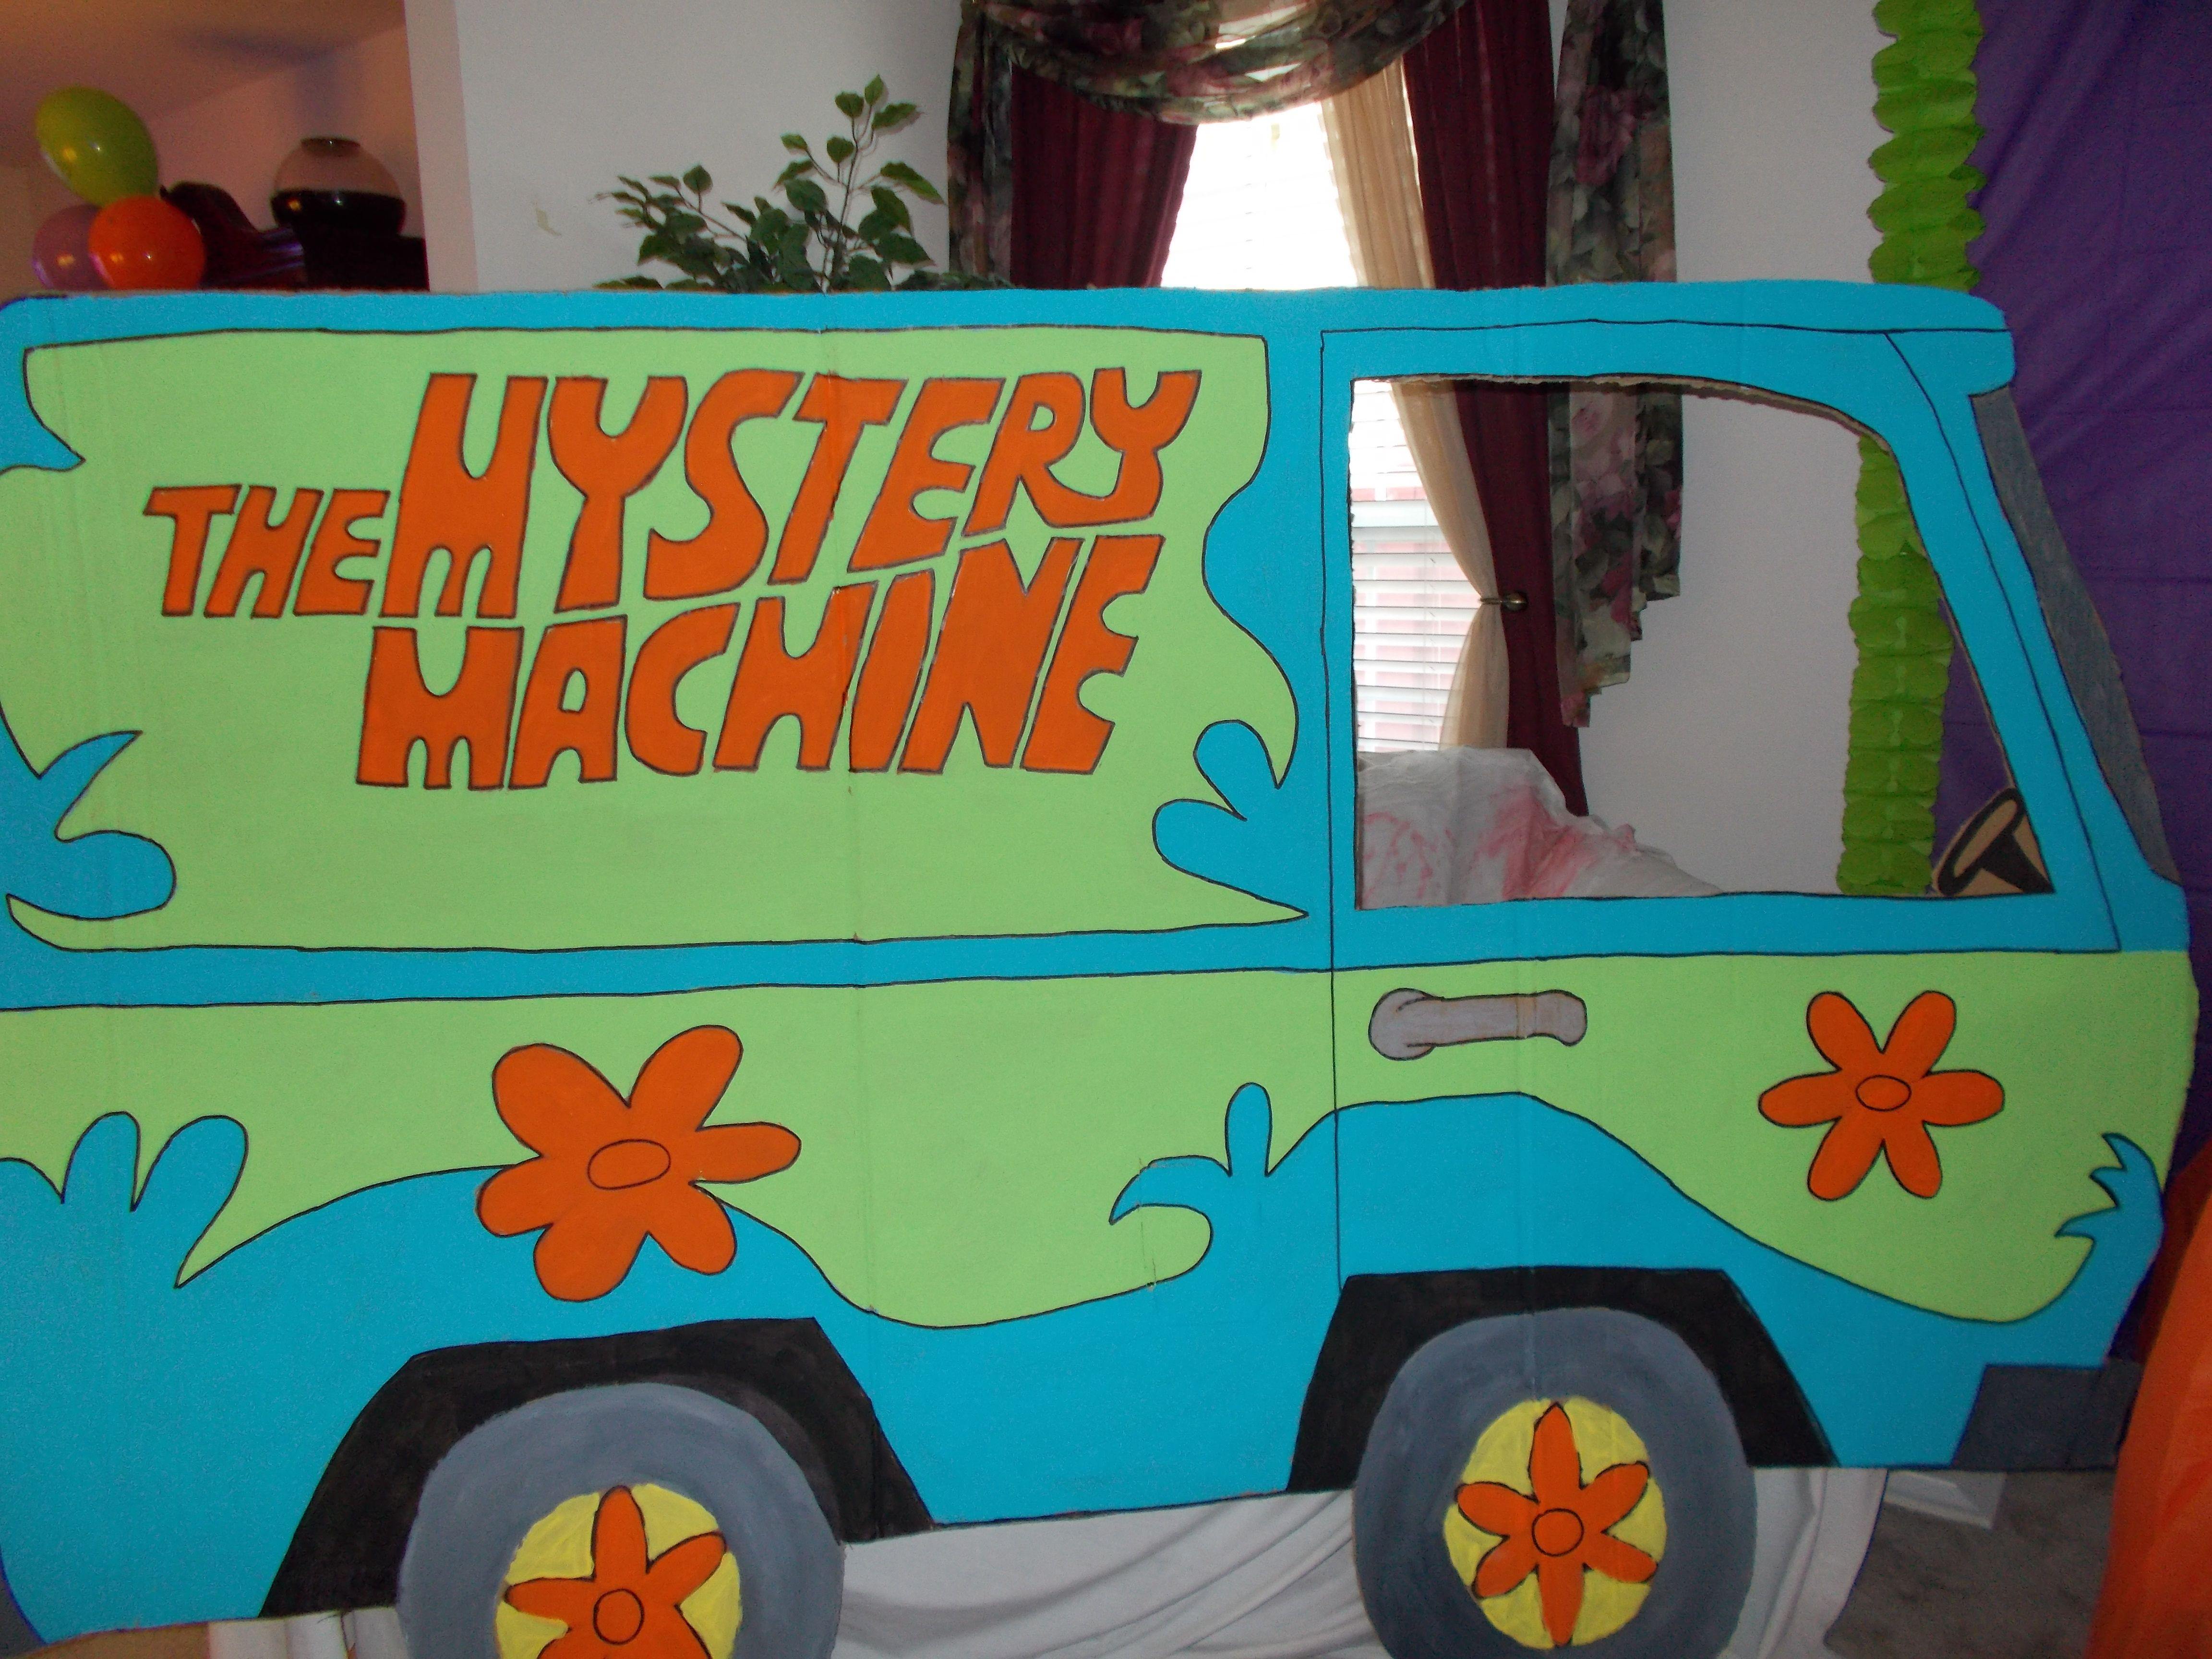 mystery machine cardboard cutout